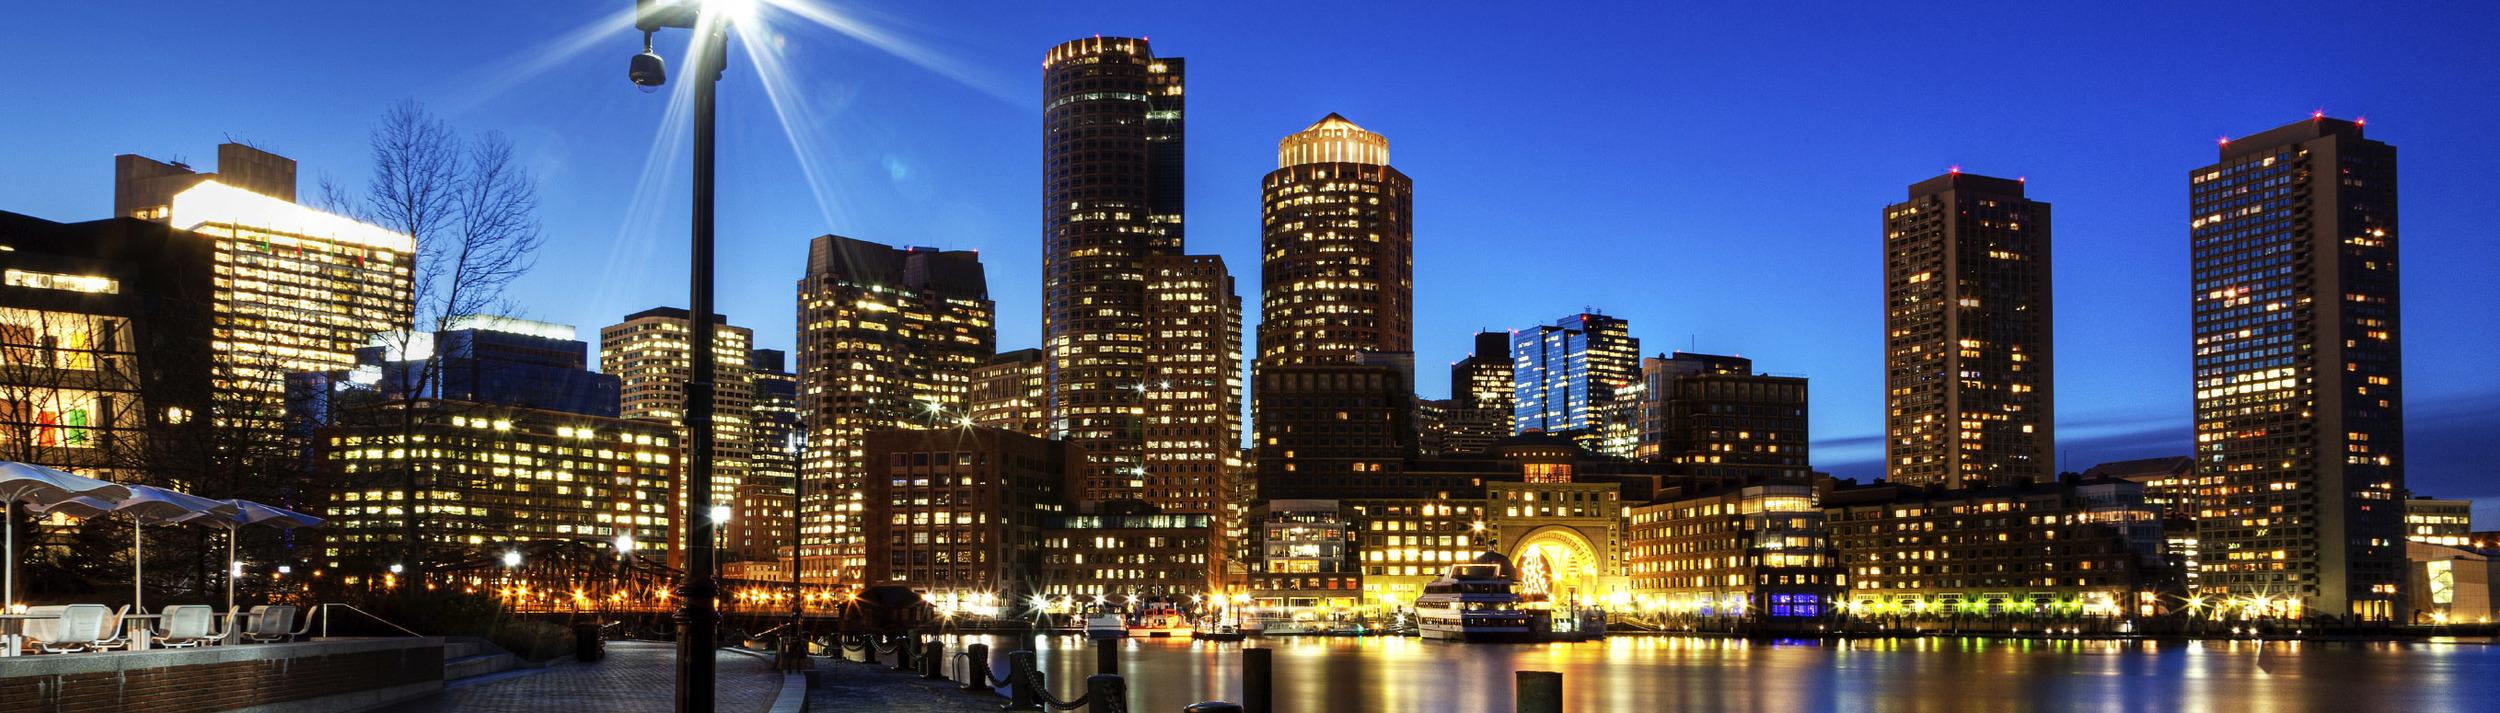 boston_small.jpg